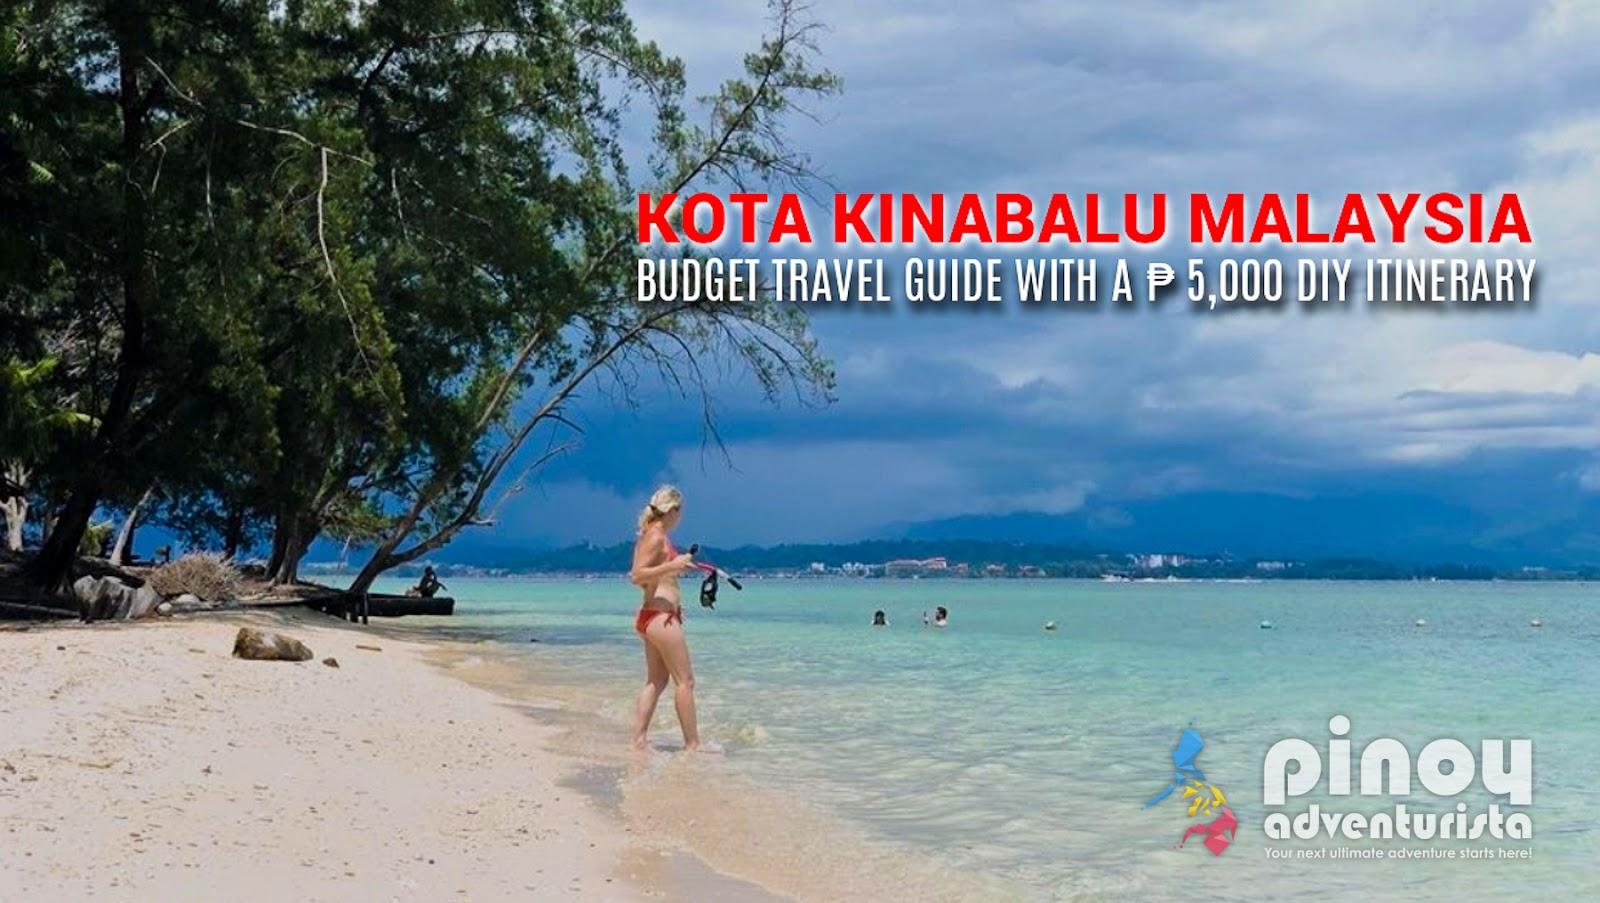 Kota Kinabalu Travel Guide 2019 Blog With A 5 000 Diy